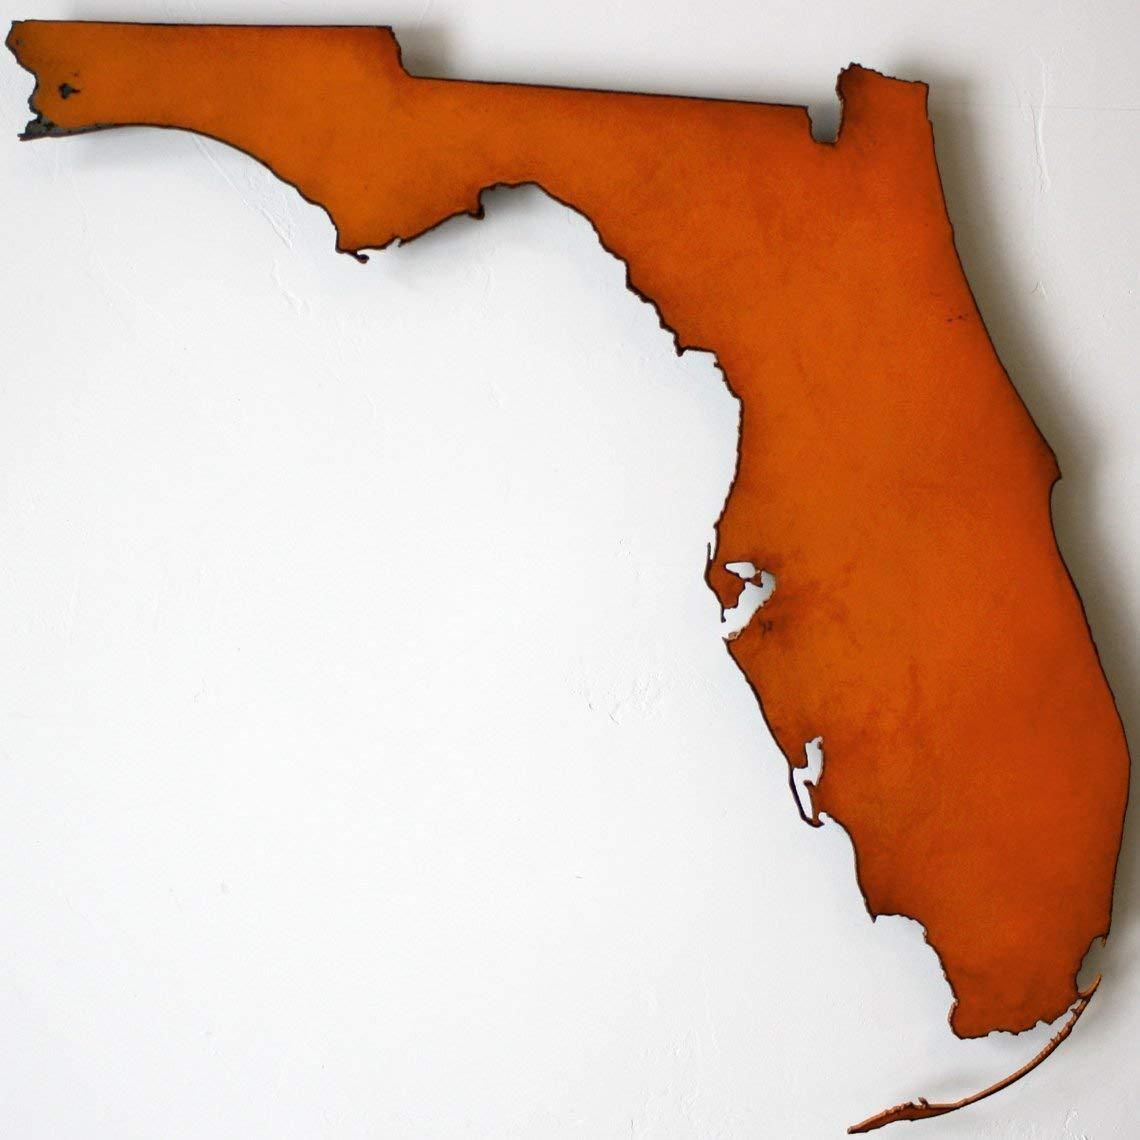 0318-20' tall - Florida map metal wall art - Handmade - Choose your patina color